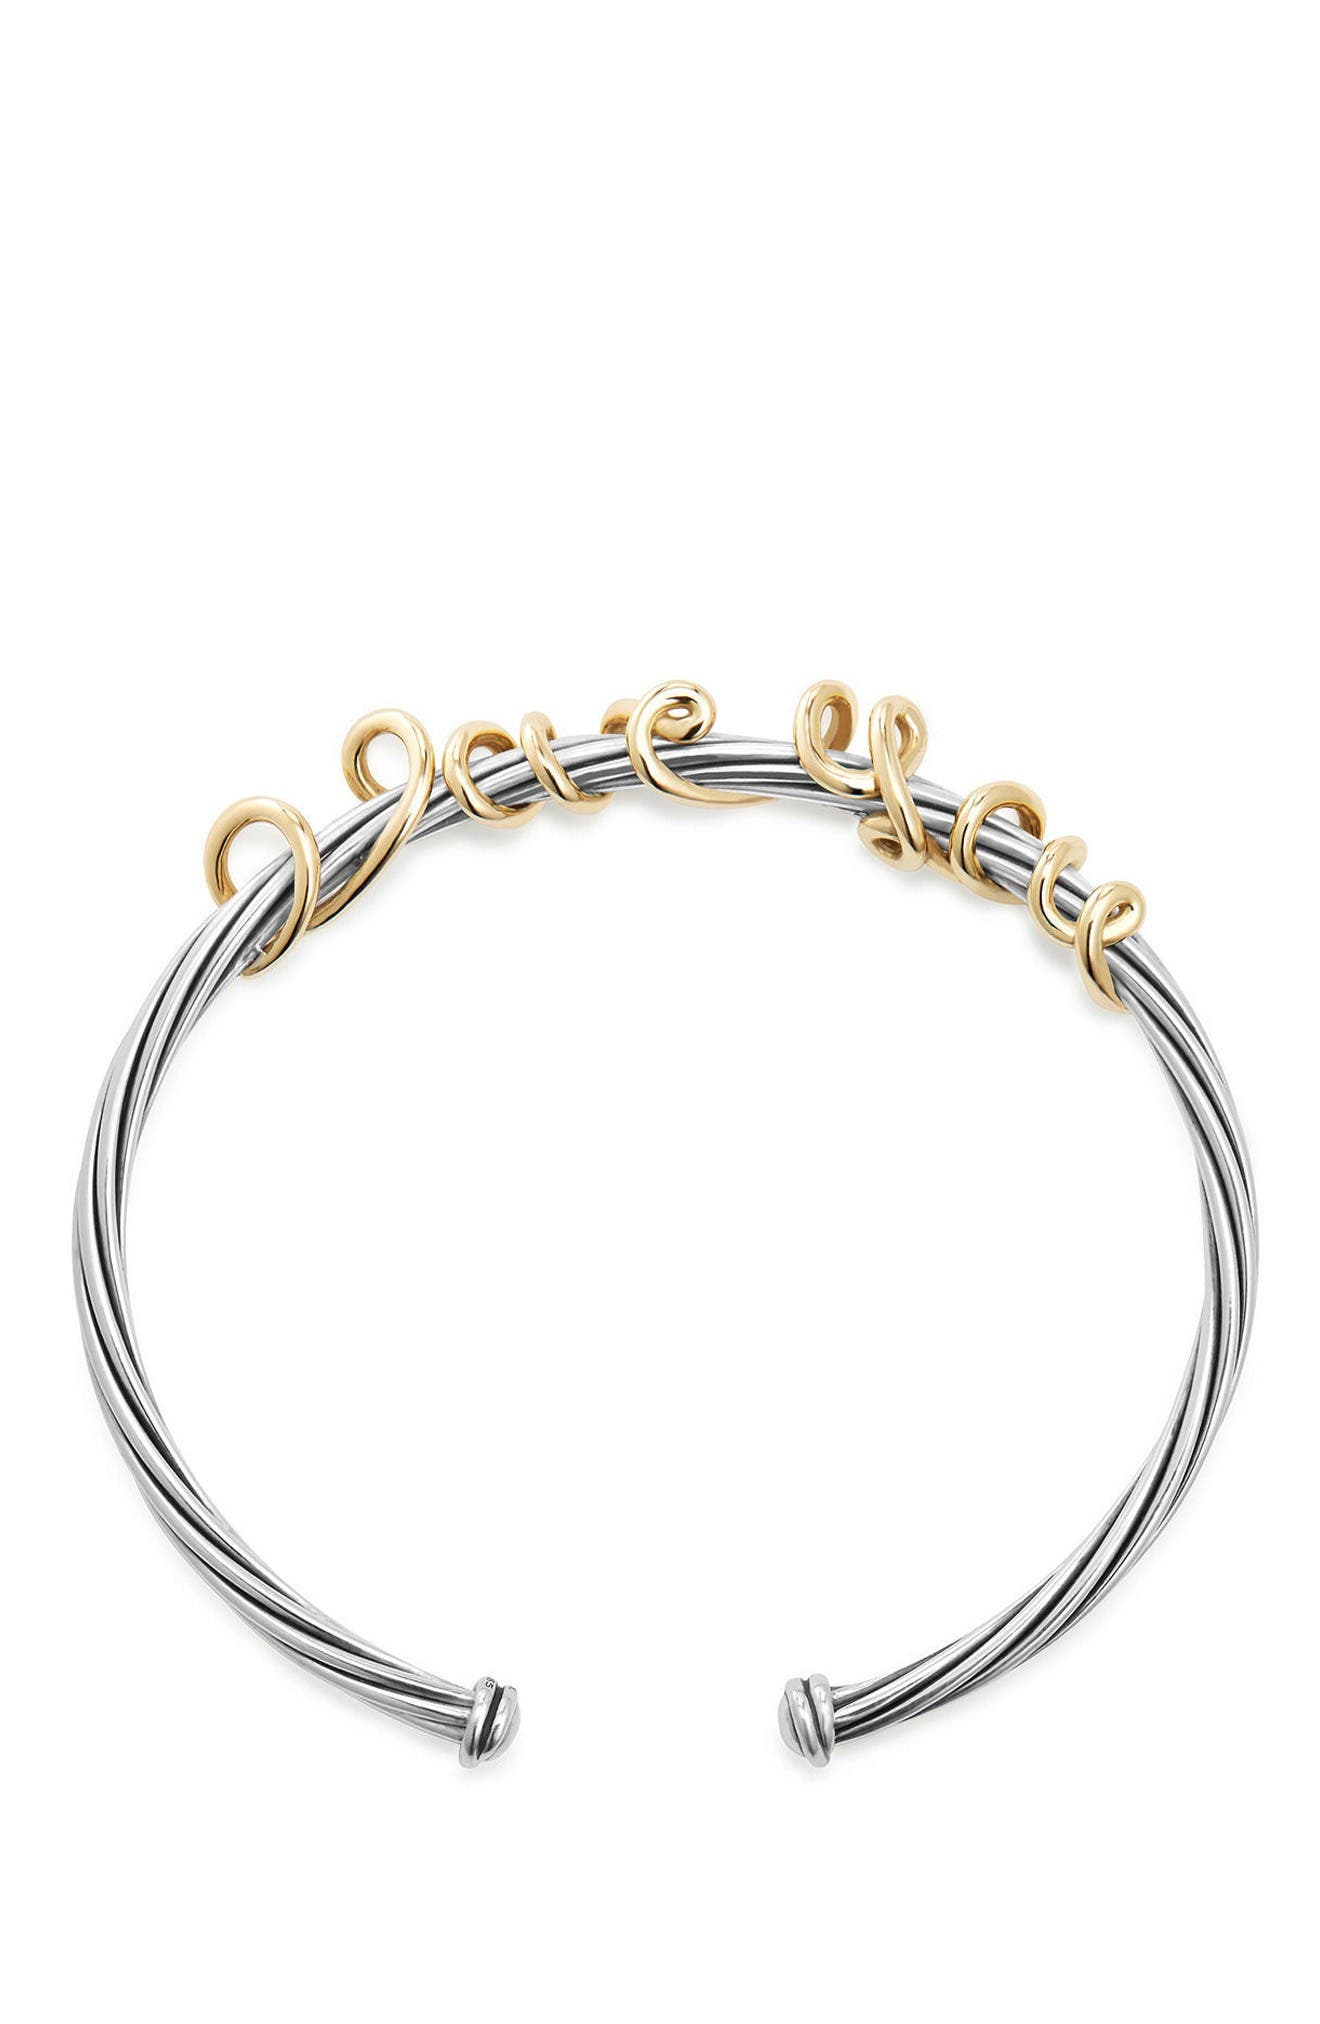 Whispers I Love You Bracelet,                             Alternate thumbnail 2, color,                             Silver/ Gold